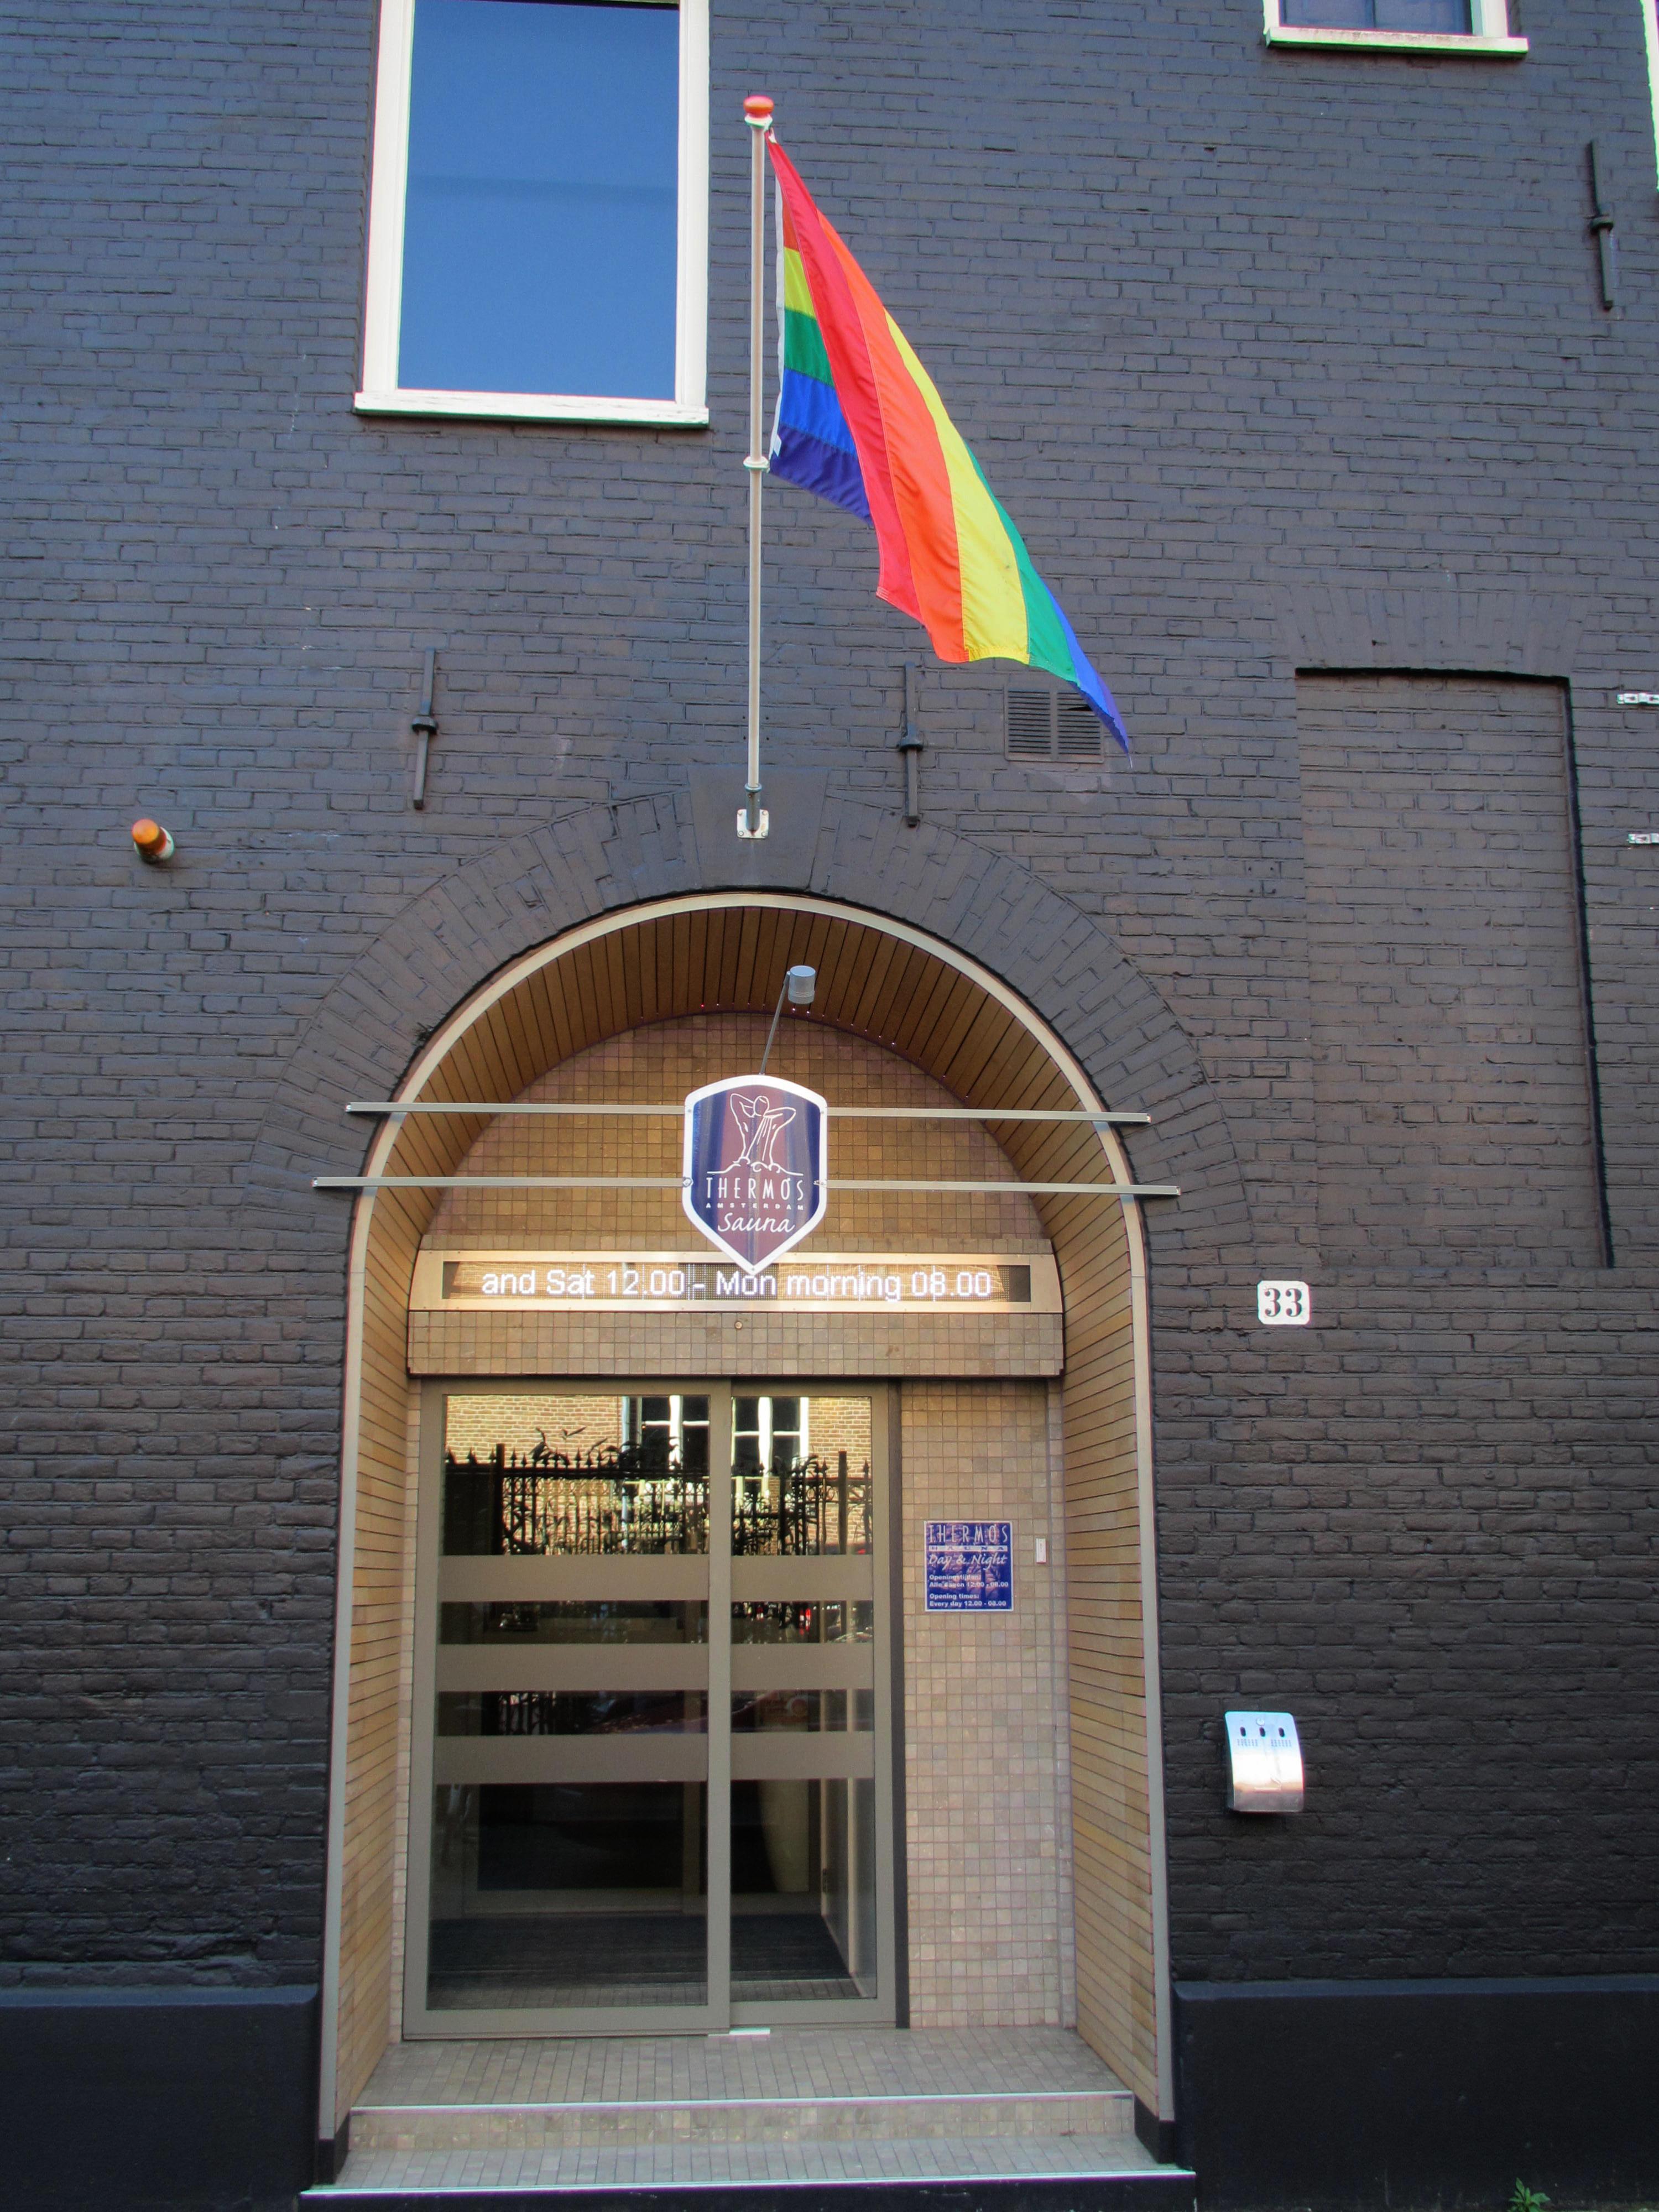 Amsterdam Thermos Gay 46